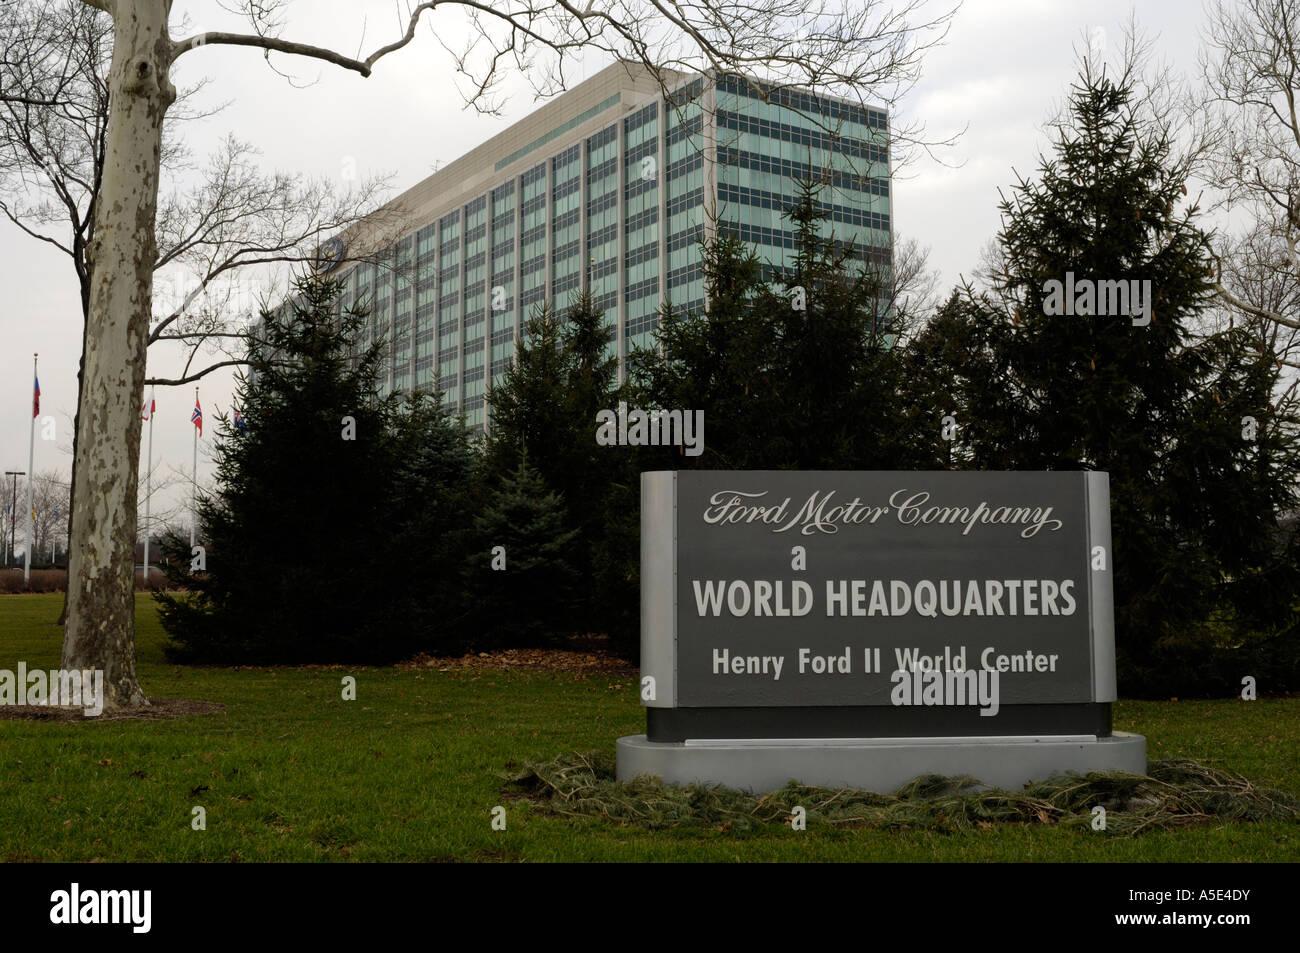 Welthauptquartier der Ford Motor Company in Dearborn, Michigan Stockbild